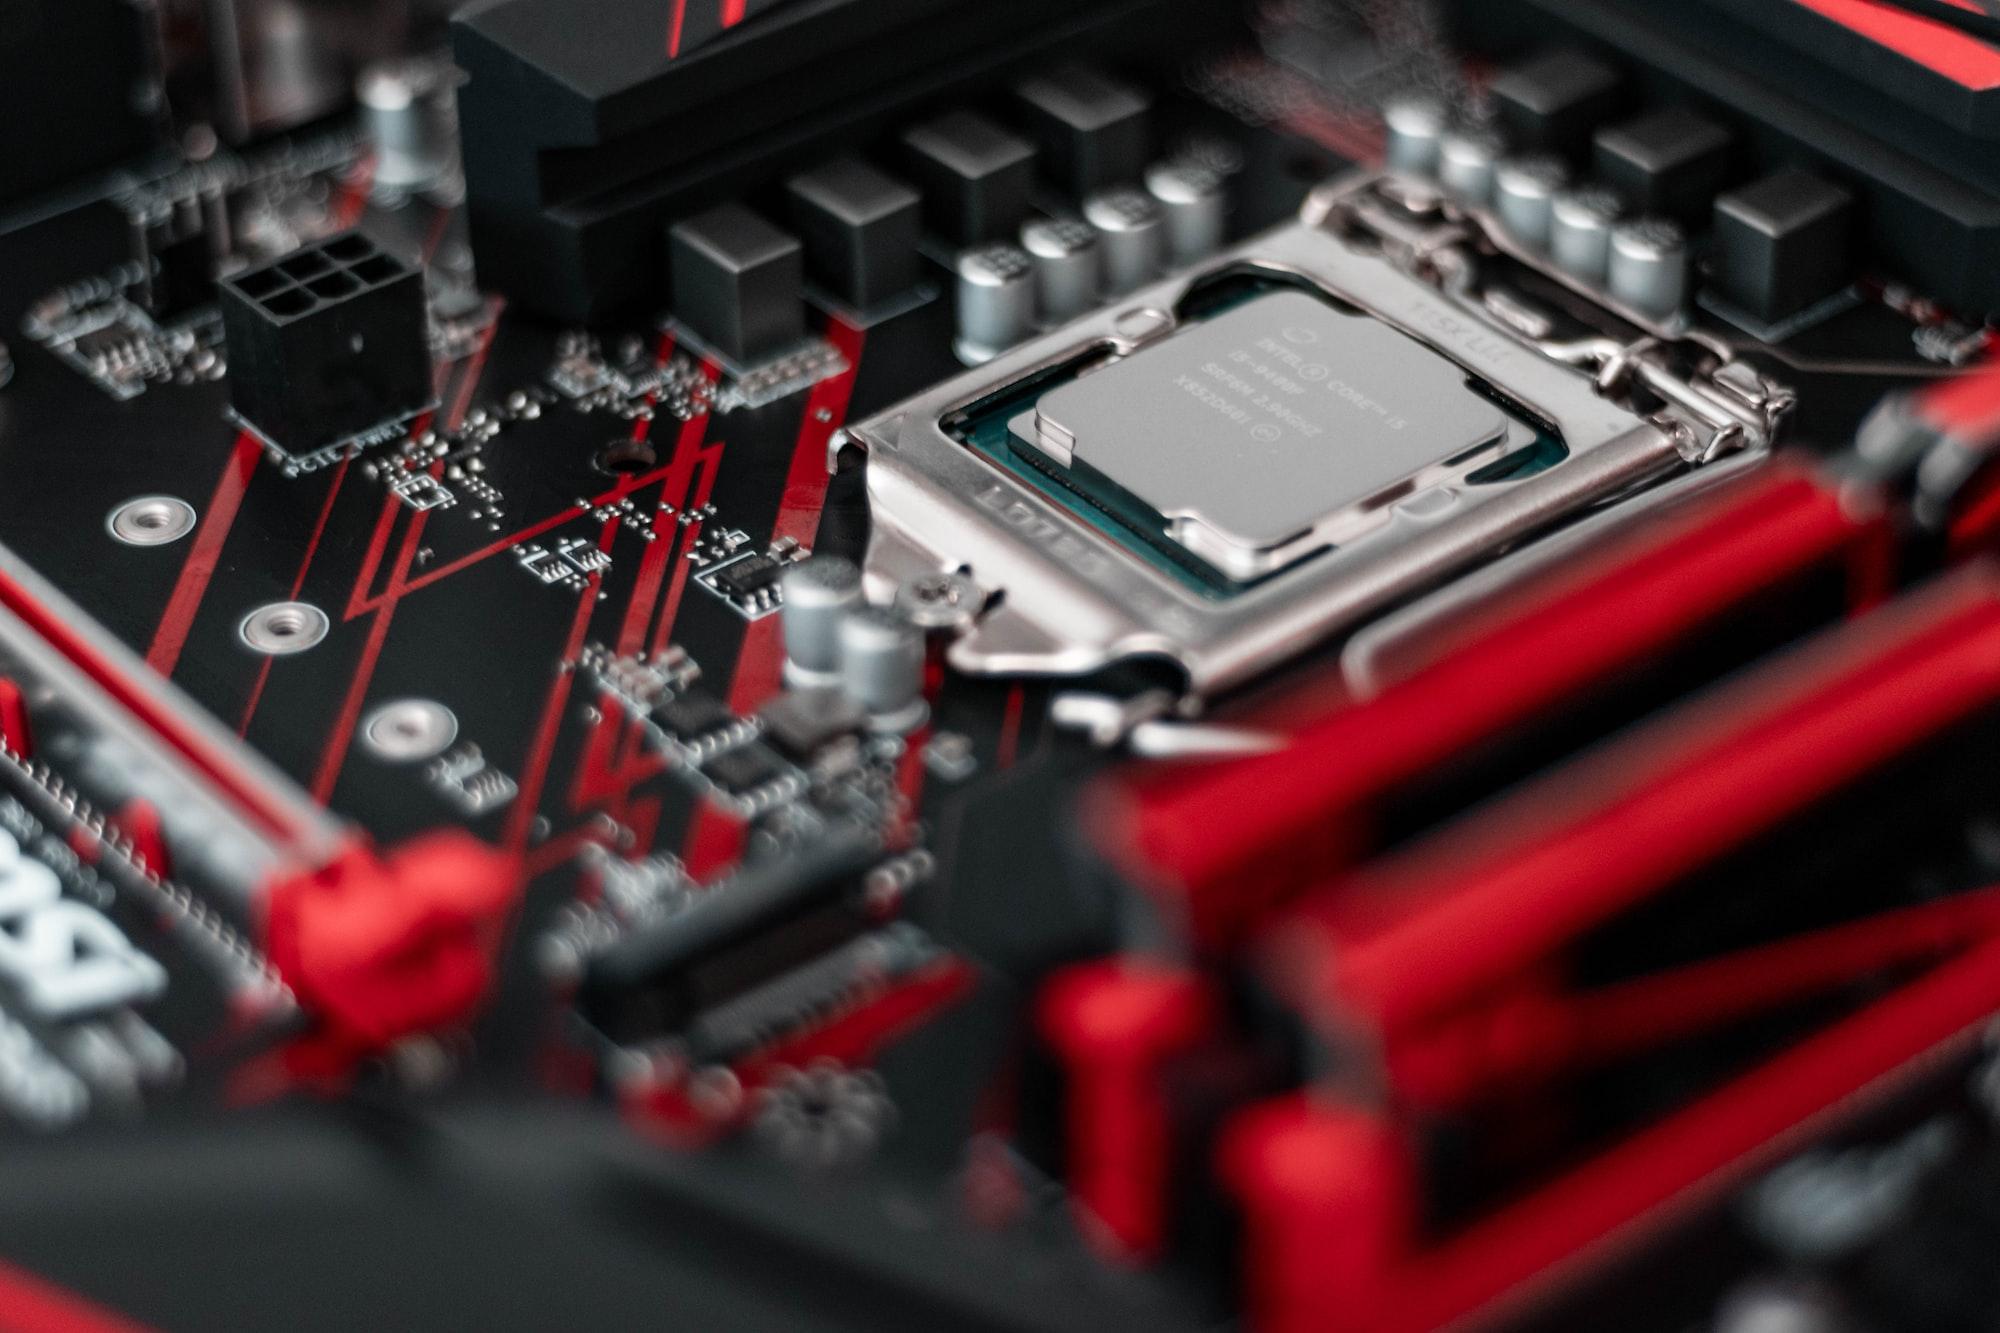 PC custom build components